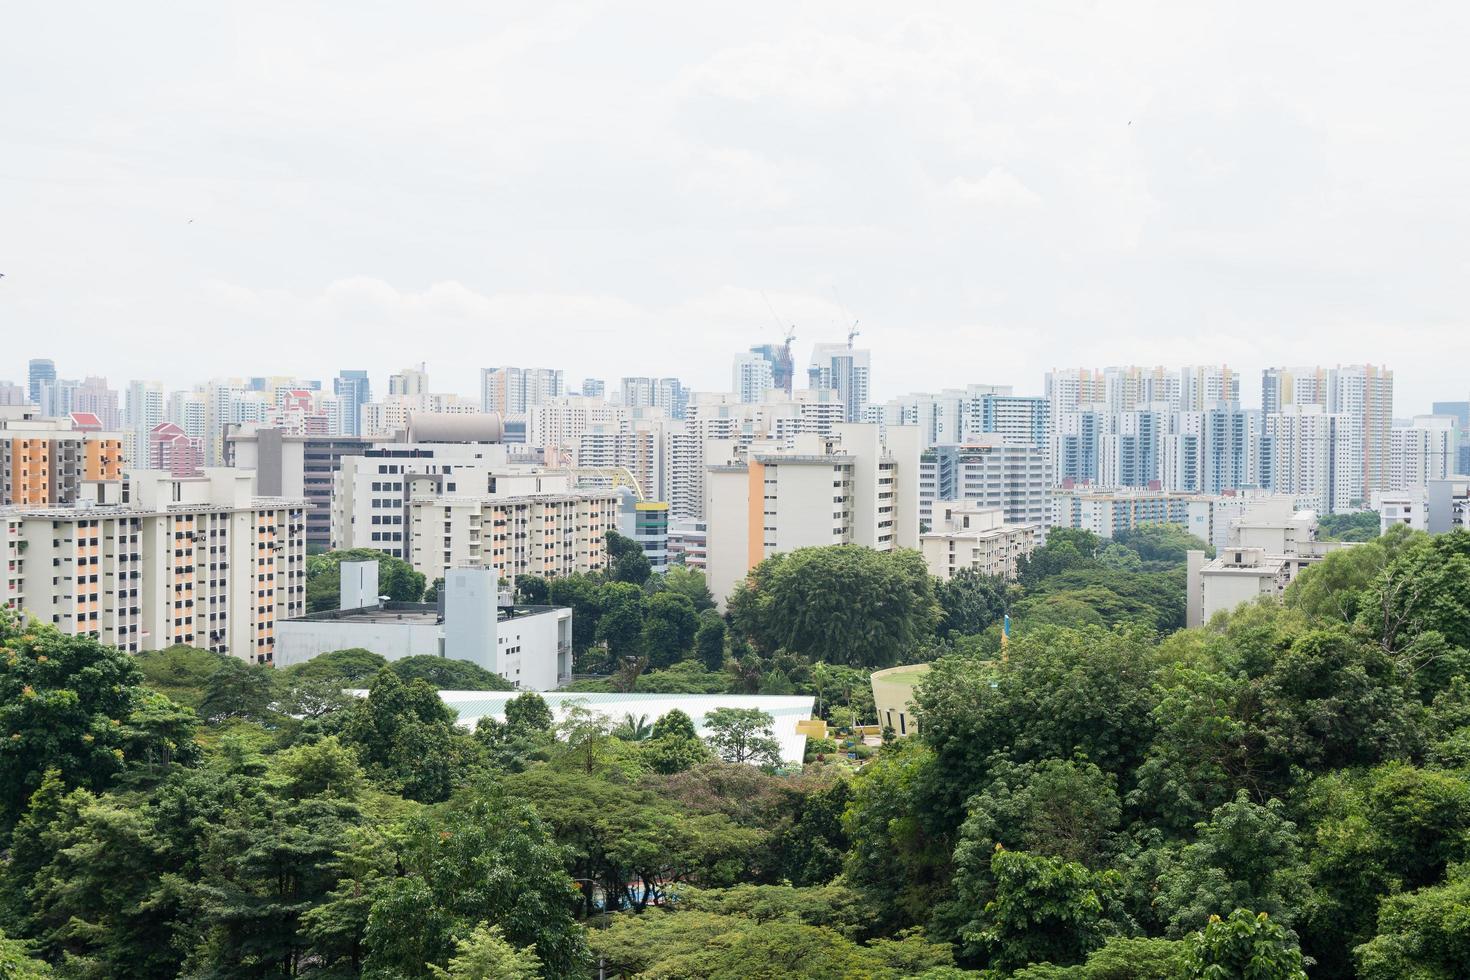 paesaggio urbano a singapore foto